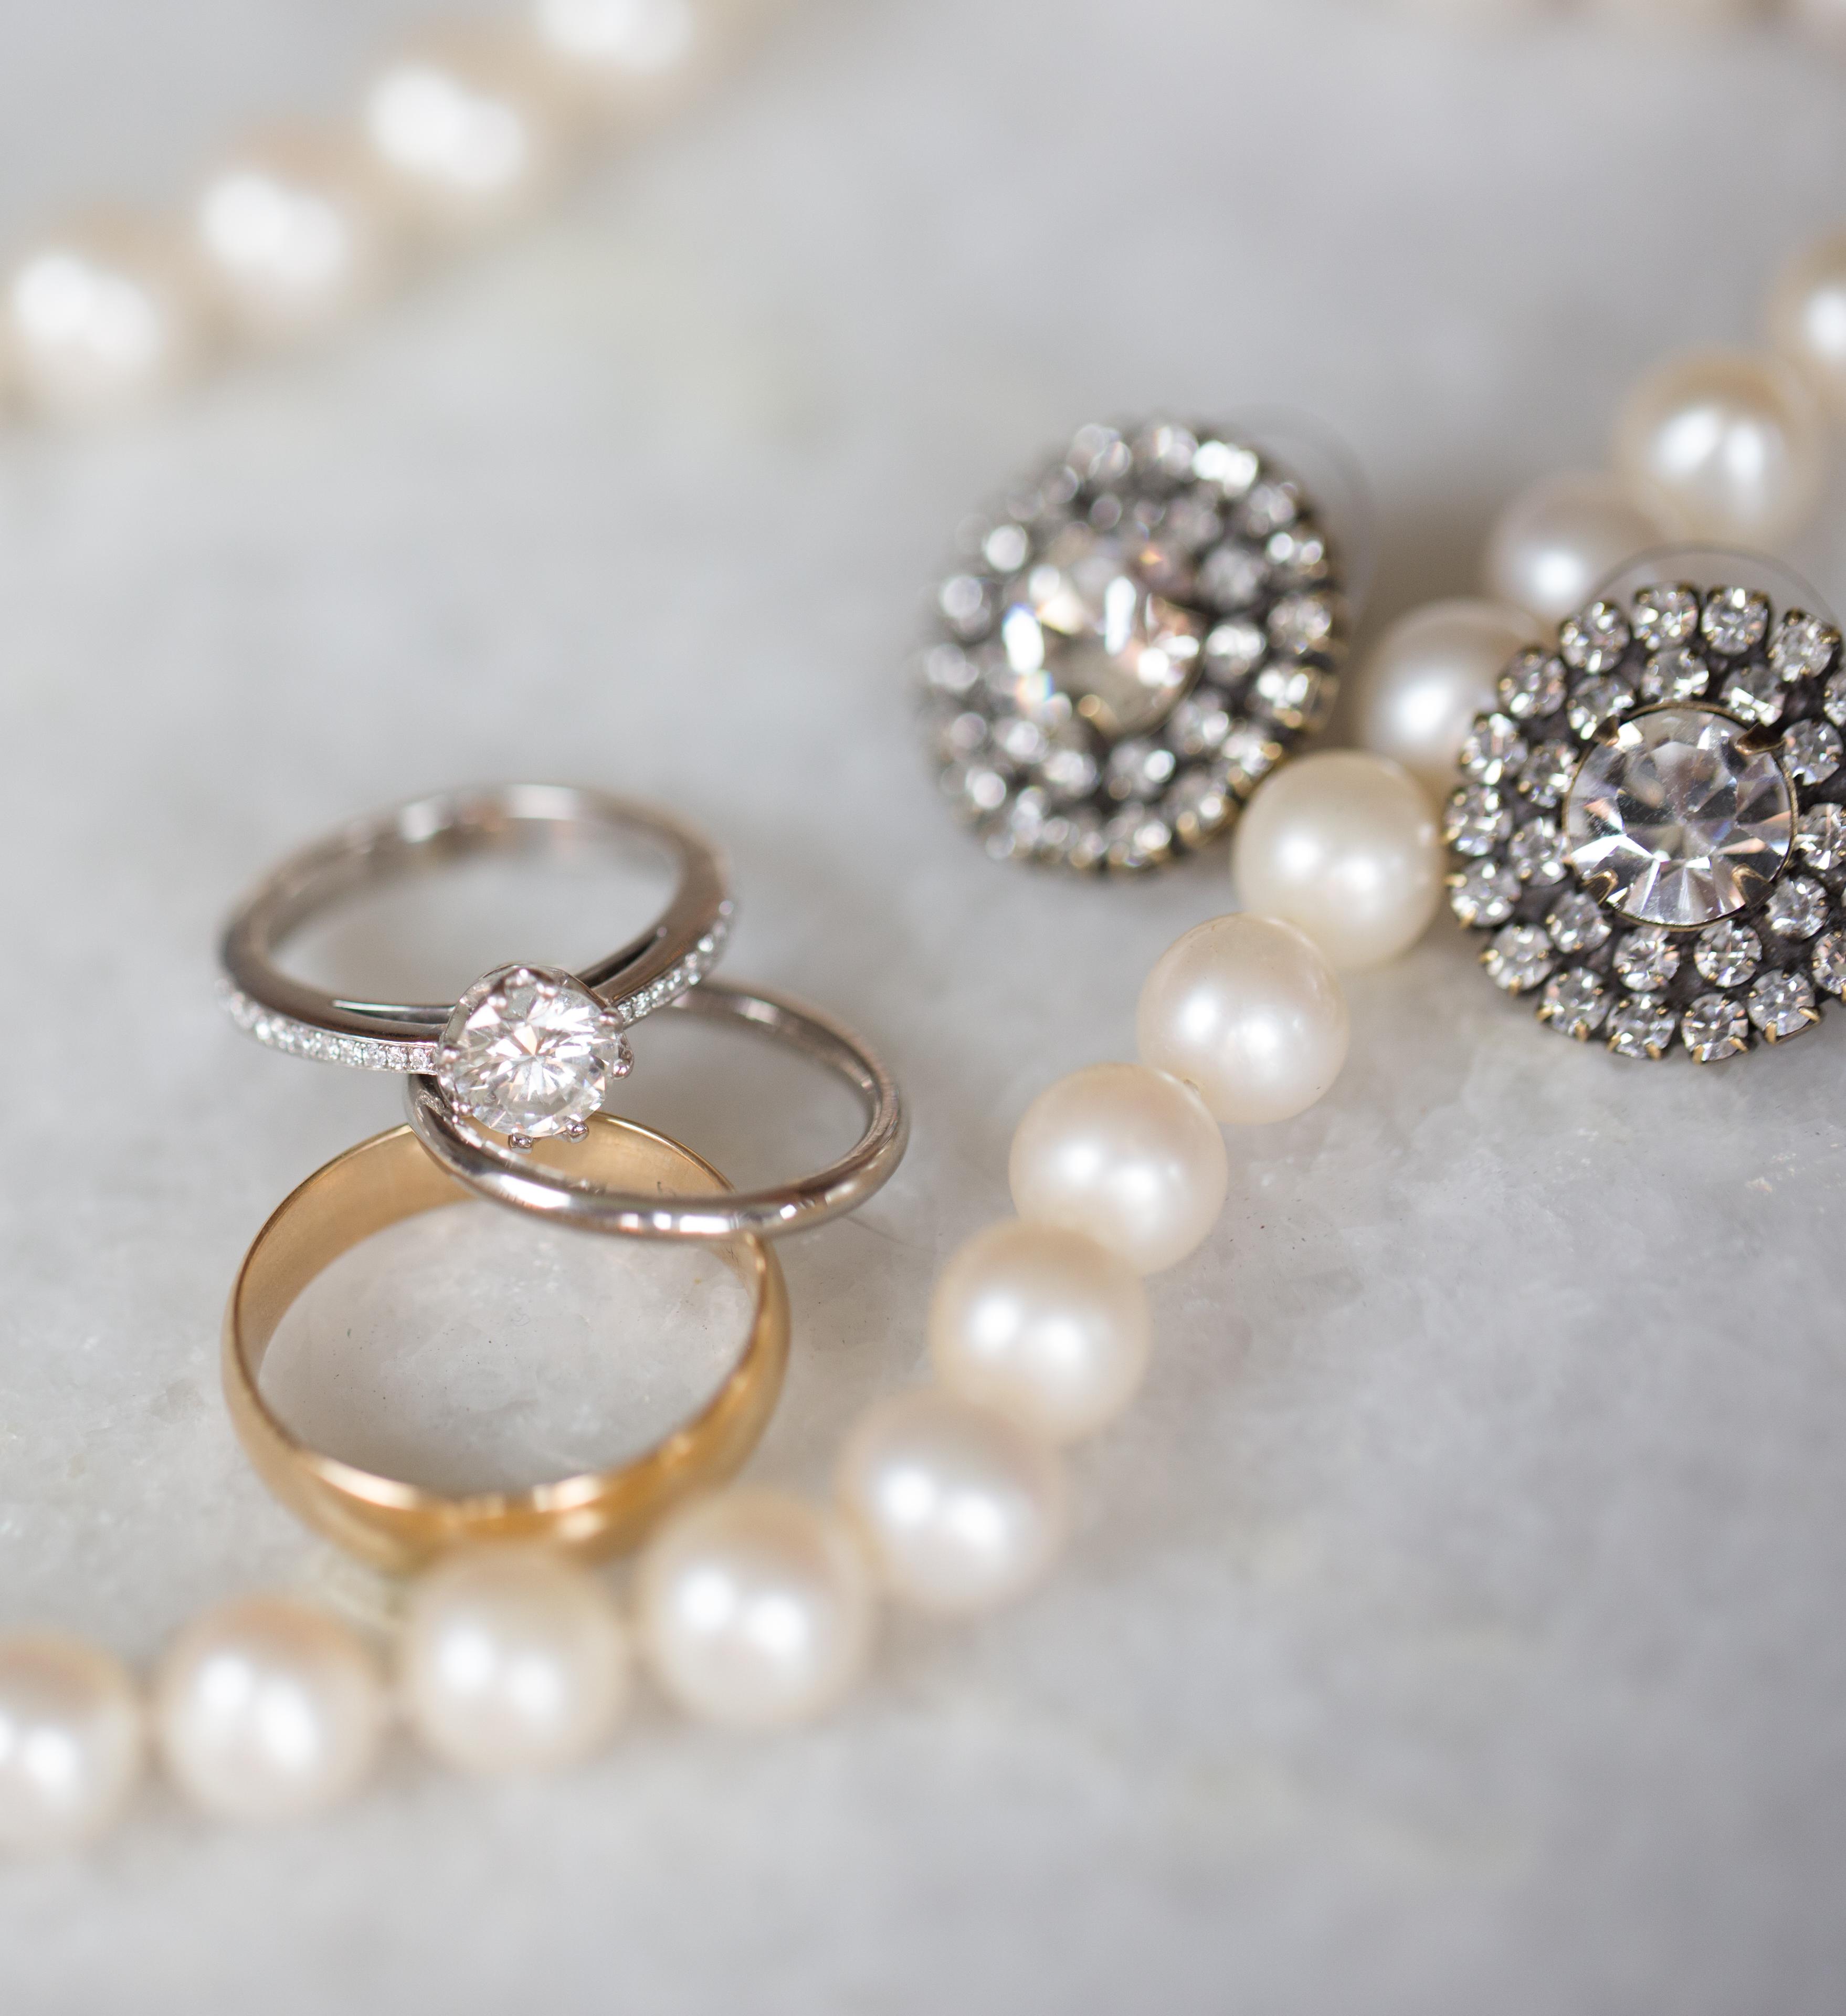 lexington virginia wedding navy and sparkles (1 of 1)-9